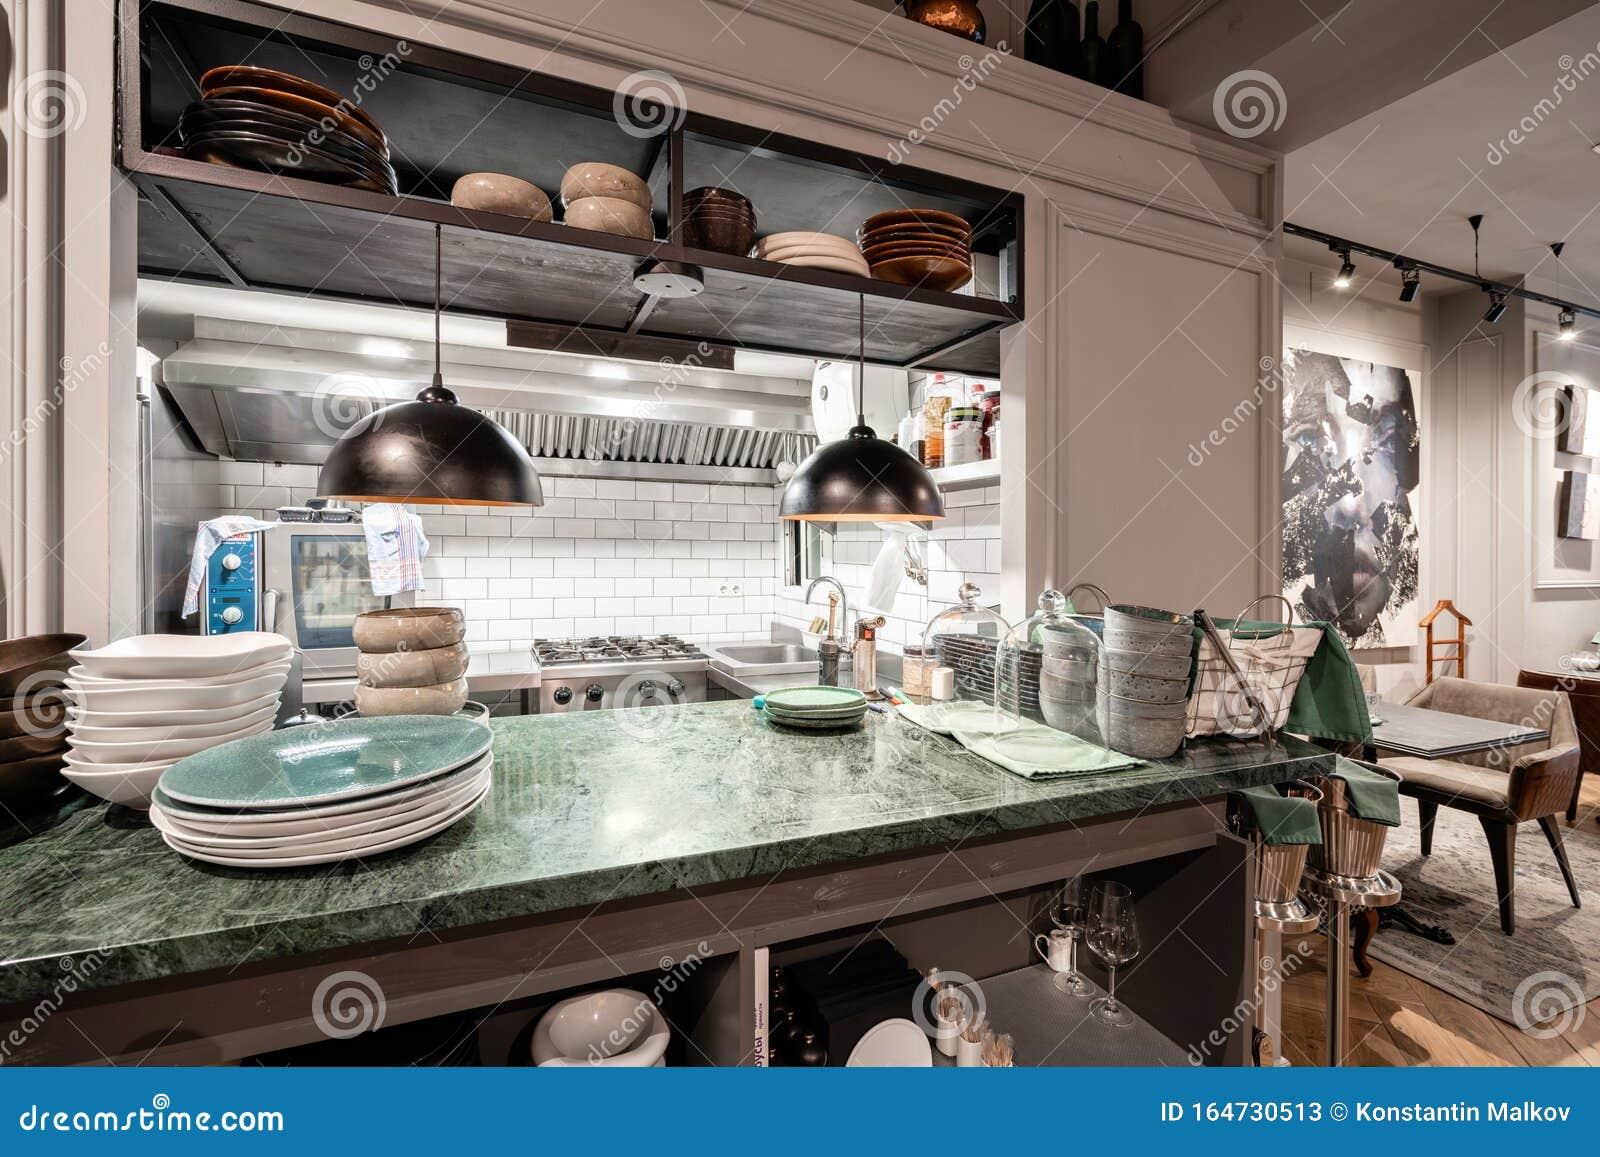 Spain Barcelona October 22 2019 Restaurant Vinogrado Open Kitchen Restaurant And Bar Interior Modern European Editorial Stock Photo Image Of Drink Barcelona 164730513